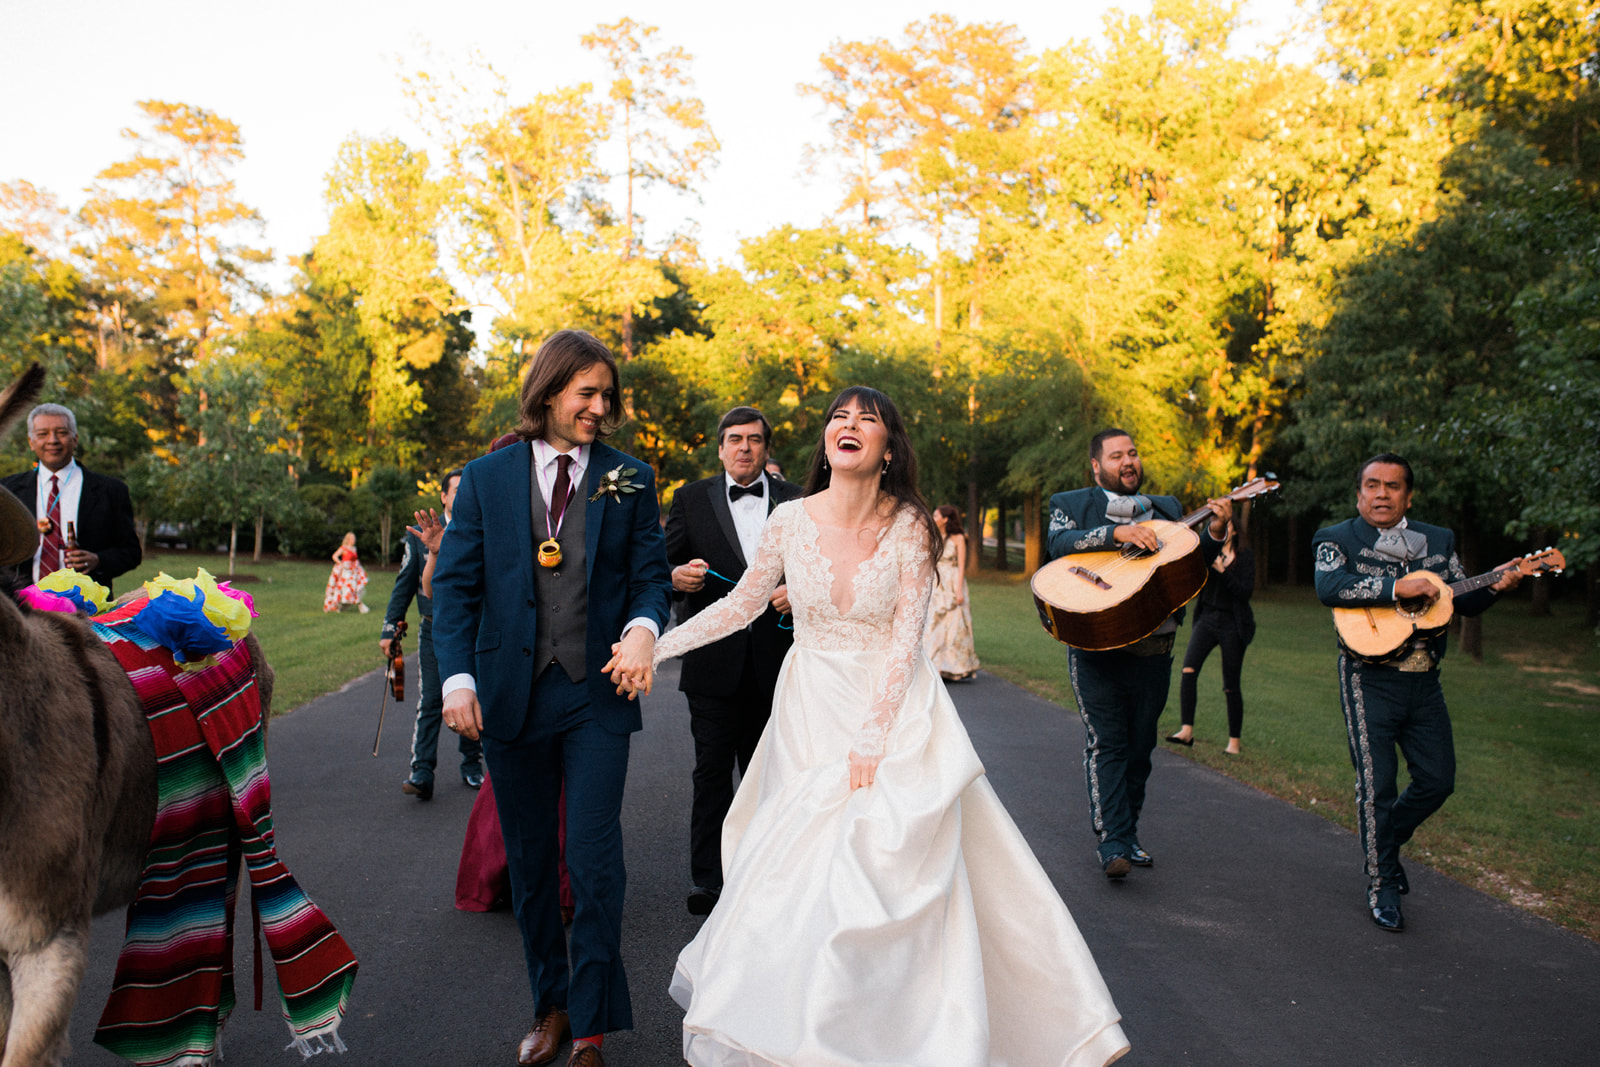 Saida + Rand: Incorporating animals into your wedding day